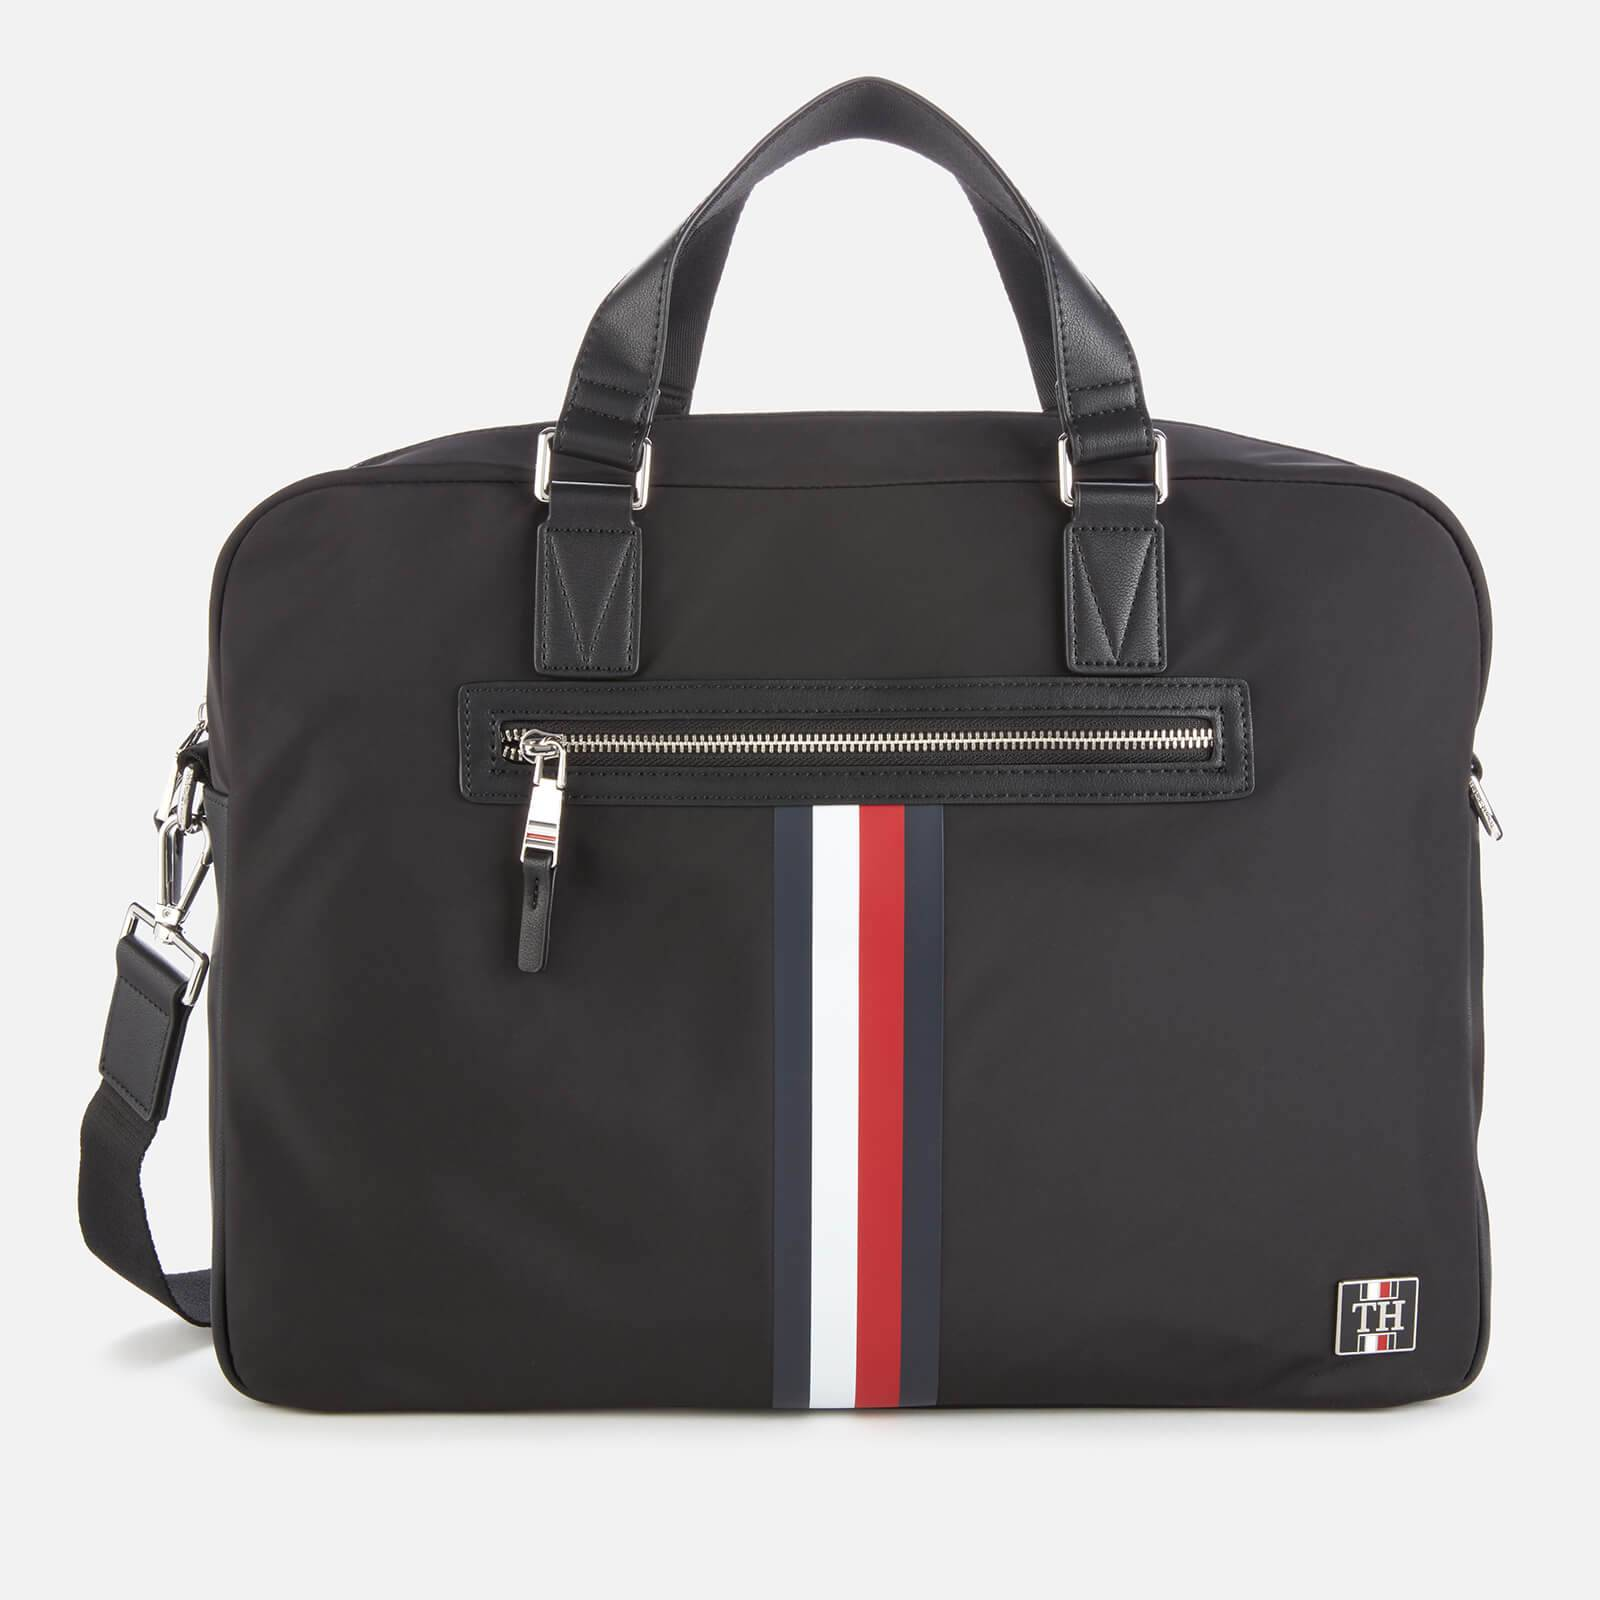 Tommy Hilfiger Men's Clean Nylon Computer Bag - Black